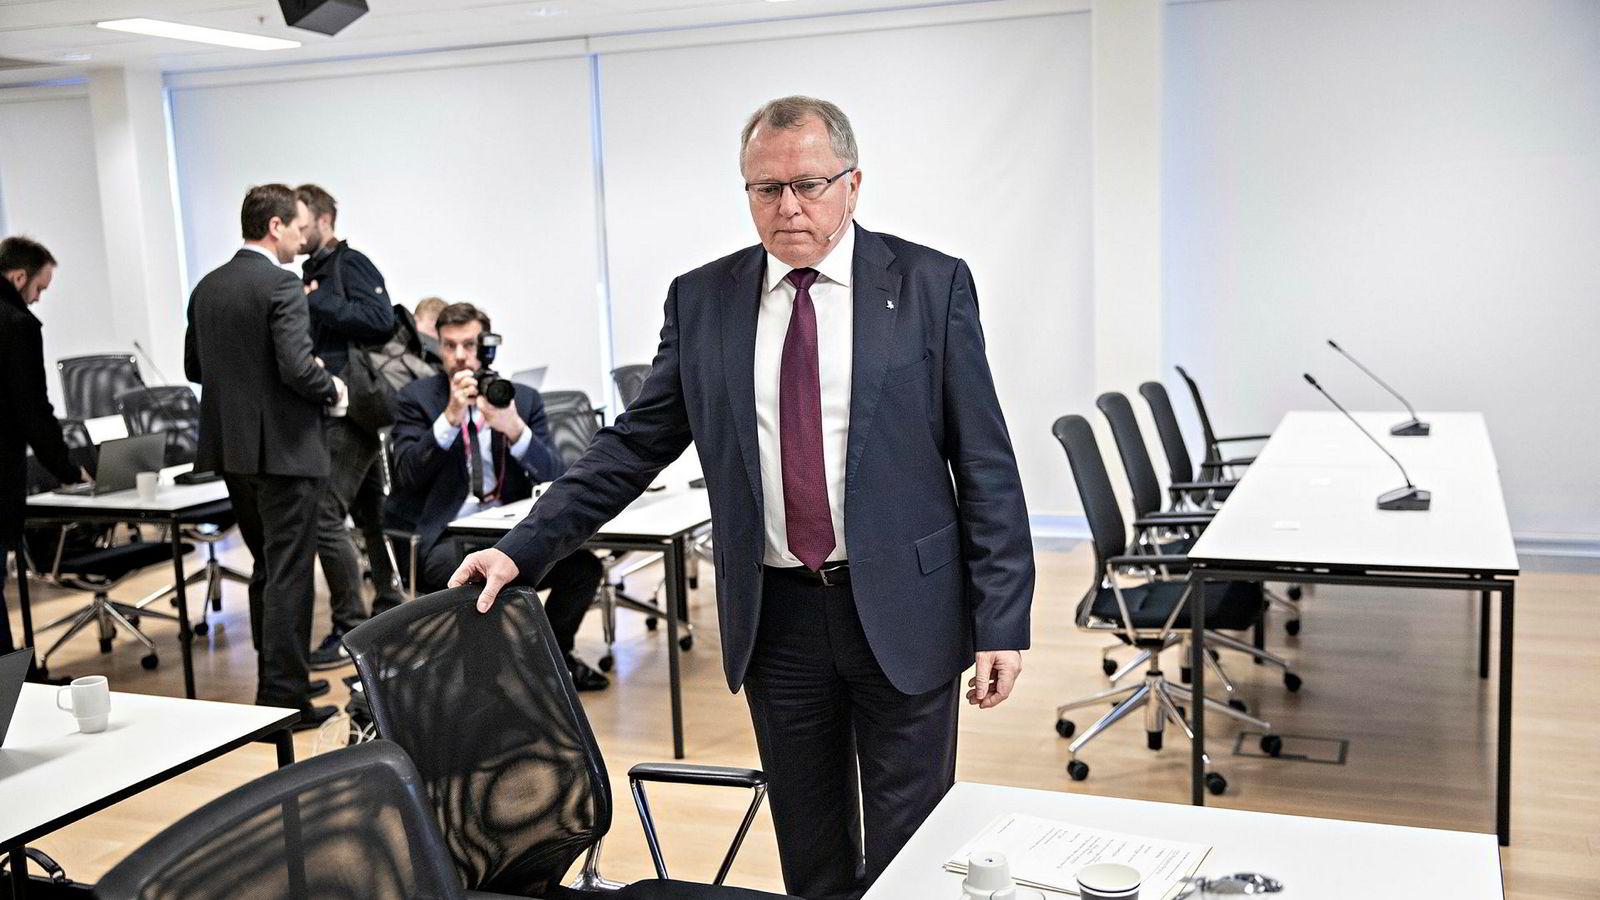 Equinor-sjef Eldar Sætre la fredag morgen frem oljeselskapets førstekvartalstall i kontorlokalene på Fornebu.